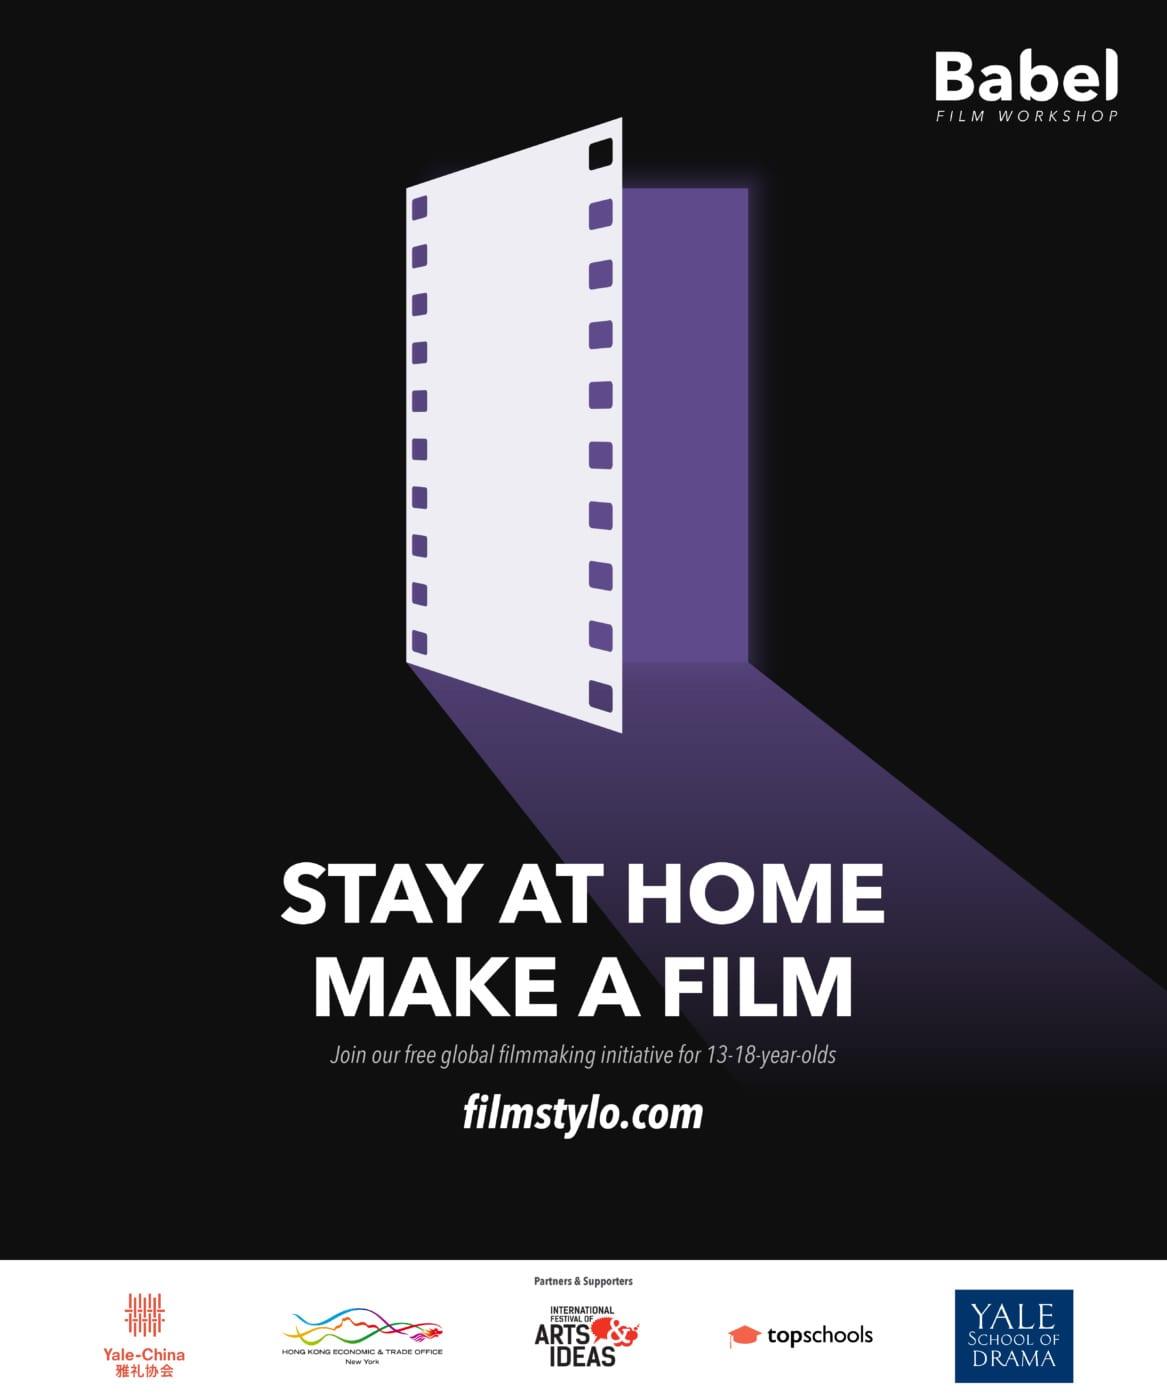 Babel Film Workshop offers free stay-at-home filmmaking program